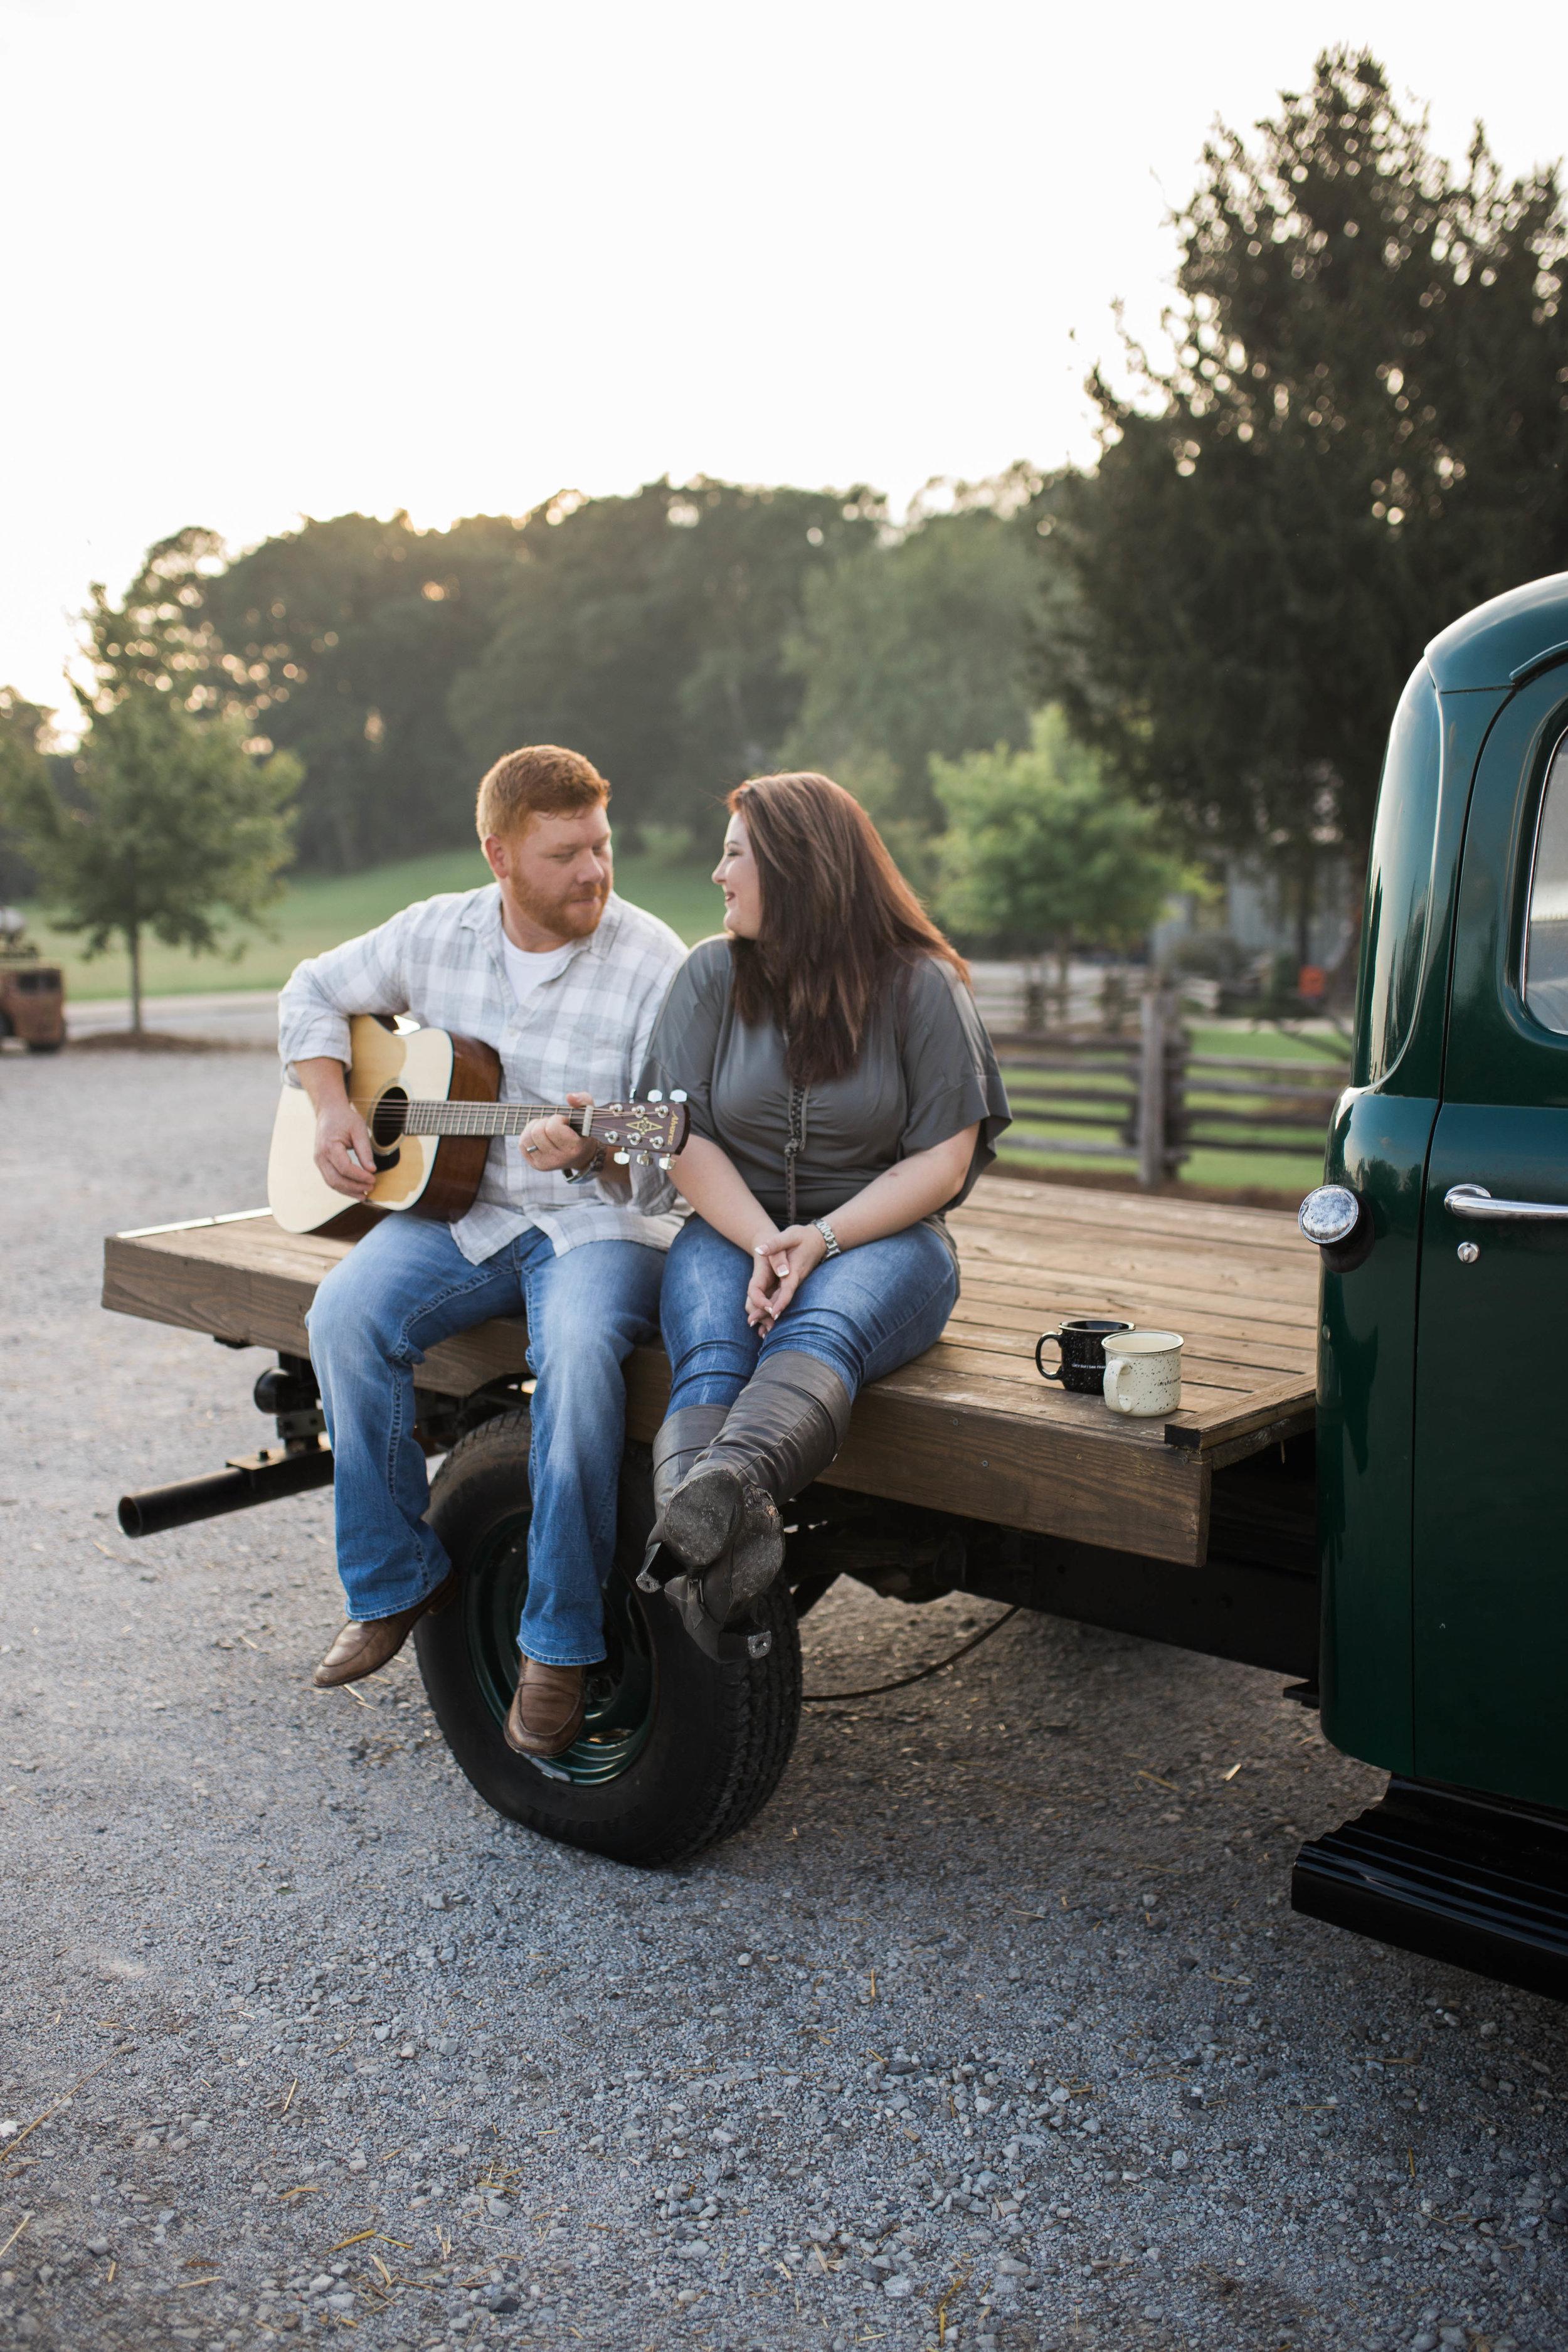 Groom to be playing guitar | Engagement Session | Cedar Creek Nursery | Montevallo, AL